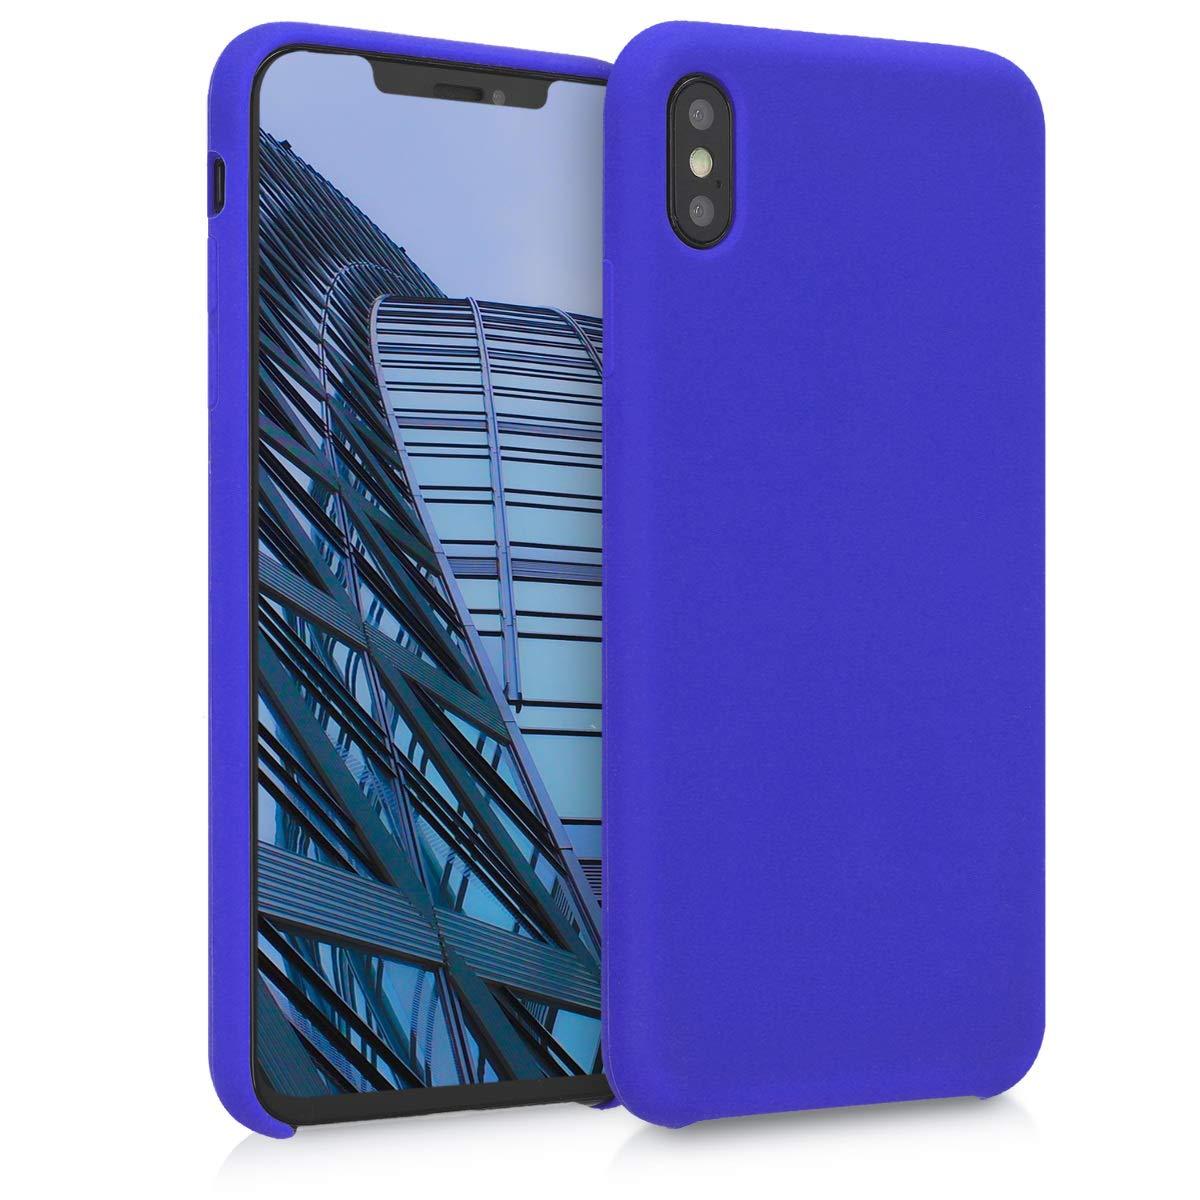 Funda para Iphone Xs Max KWMOBILE (7QH5M8JC)